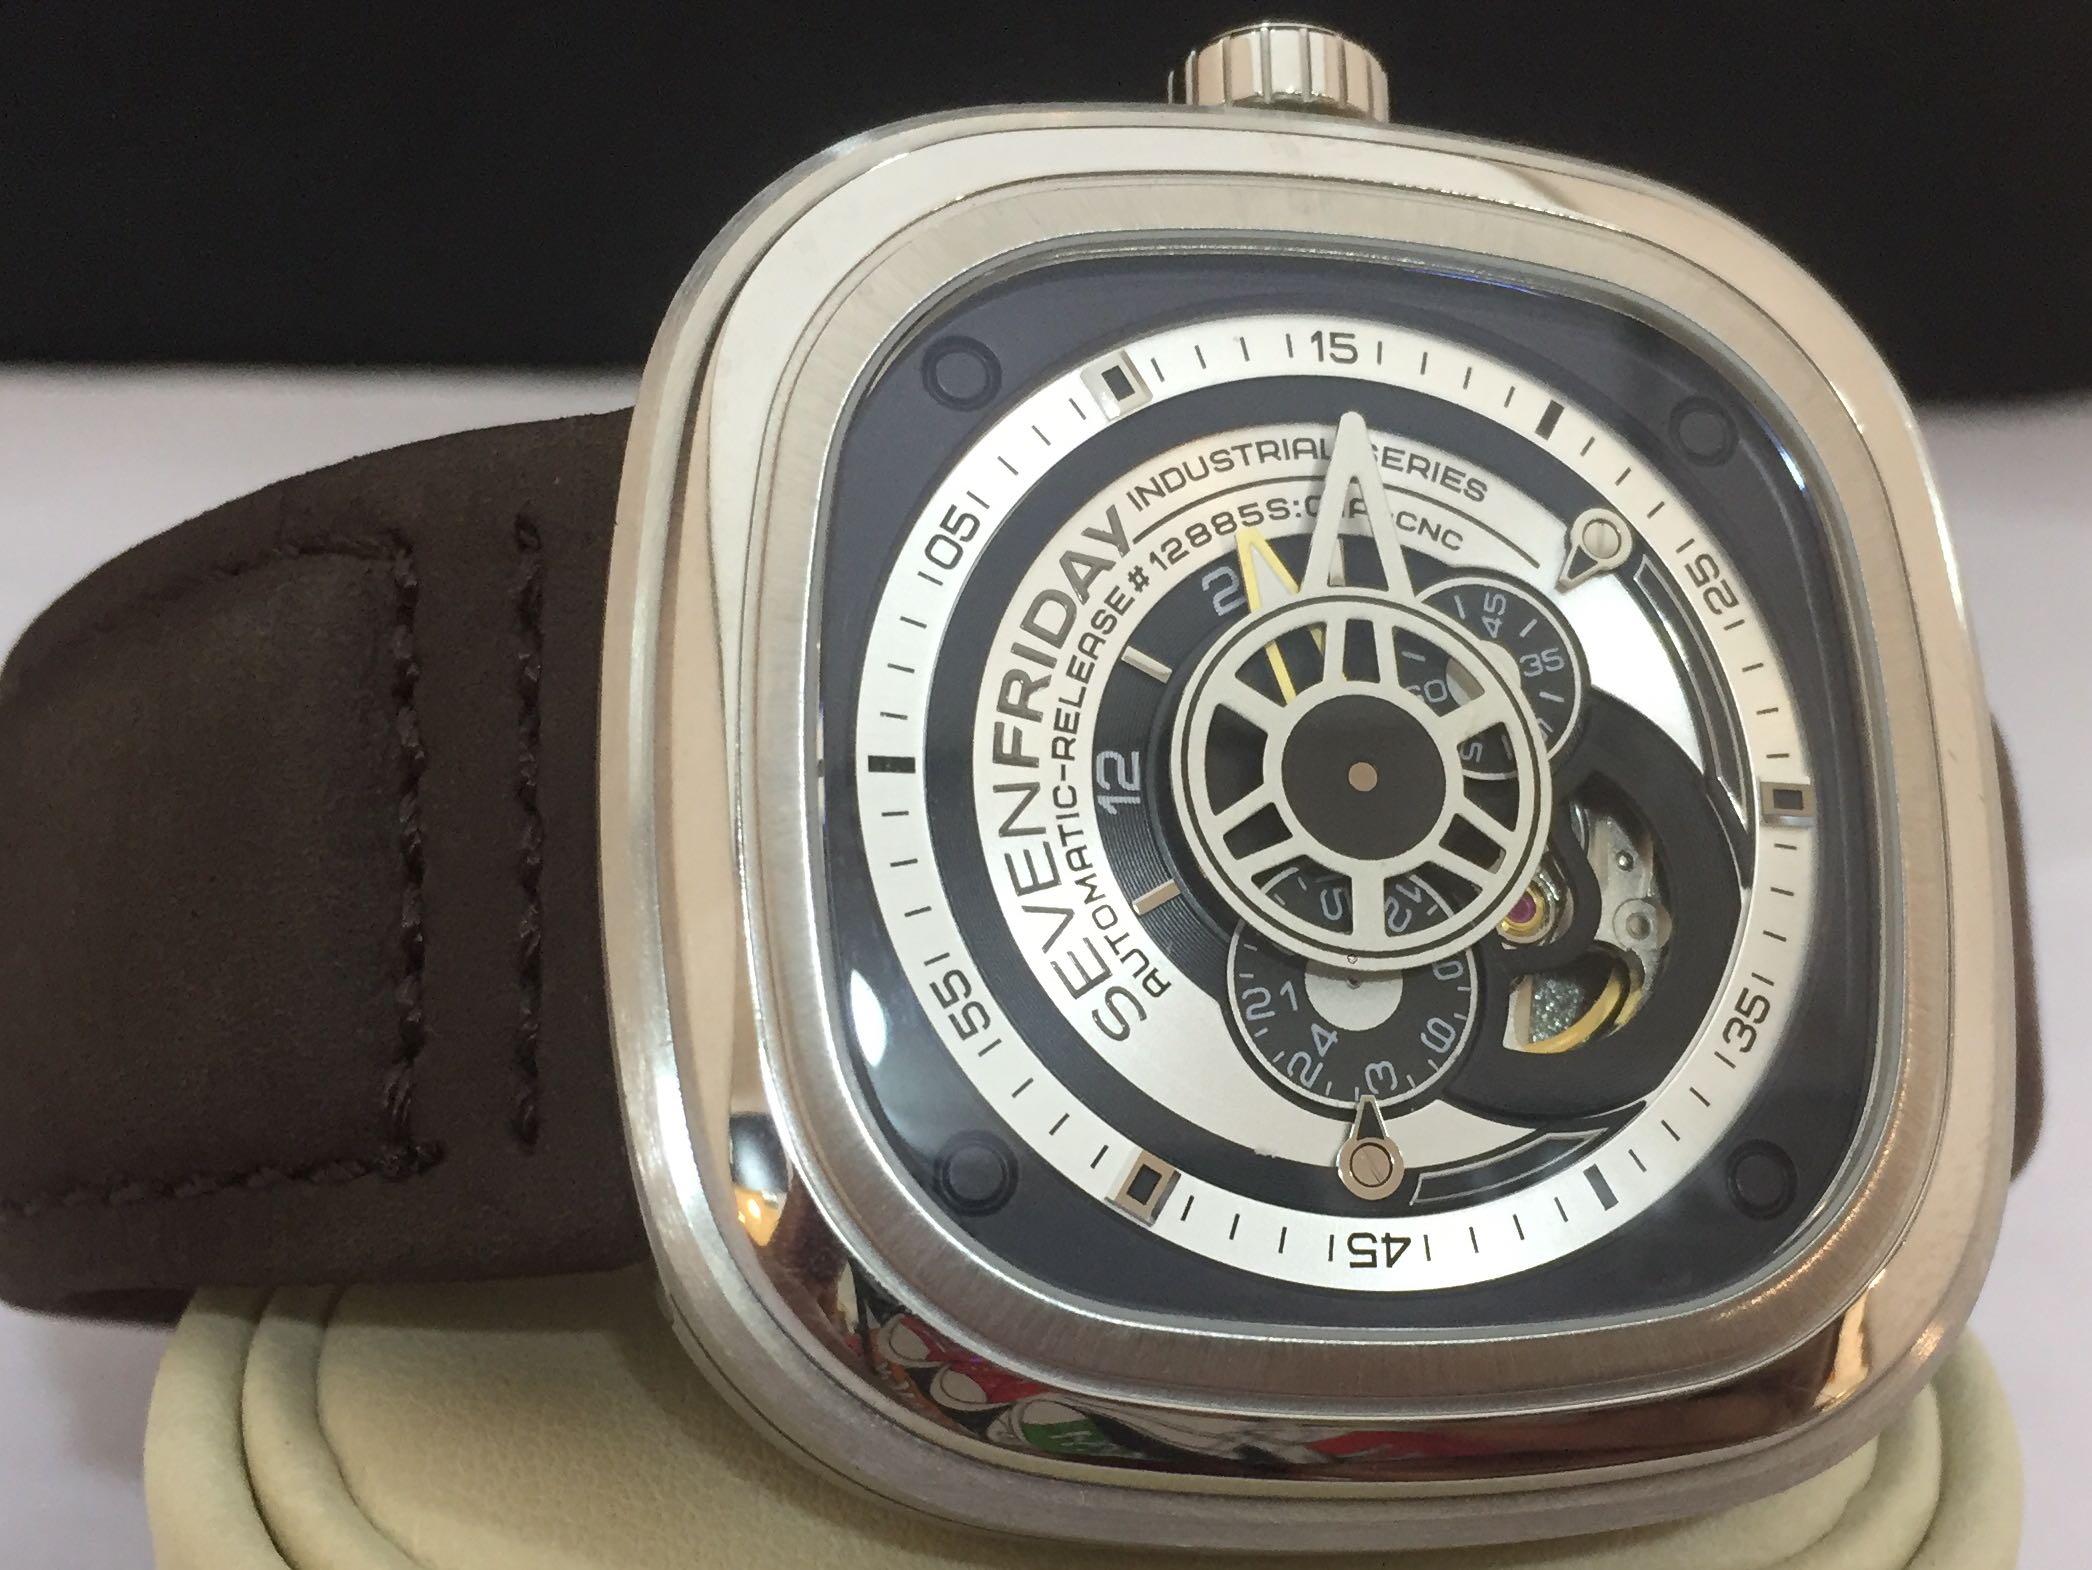 Preowned Sevenfriday Industrial Essence Silver And Black Dial P1b Automatic Mens Watch 1 Barangan Mewah Jam Tangan Di Carousell